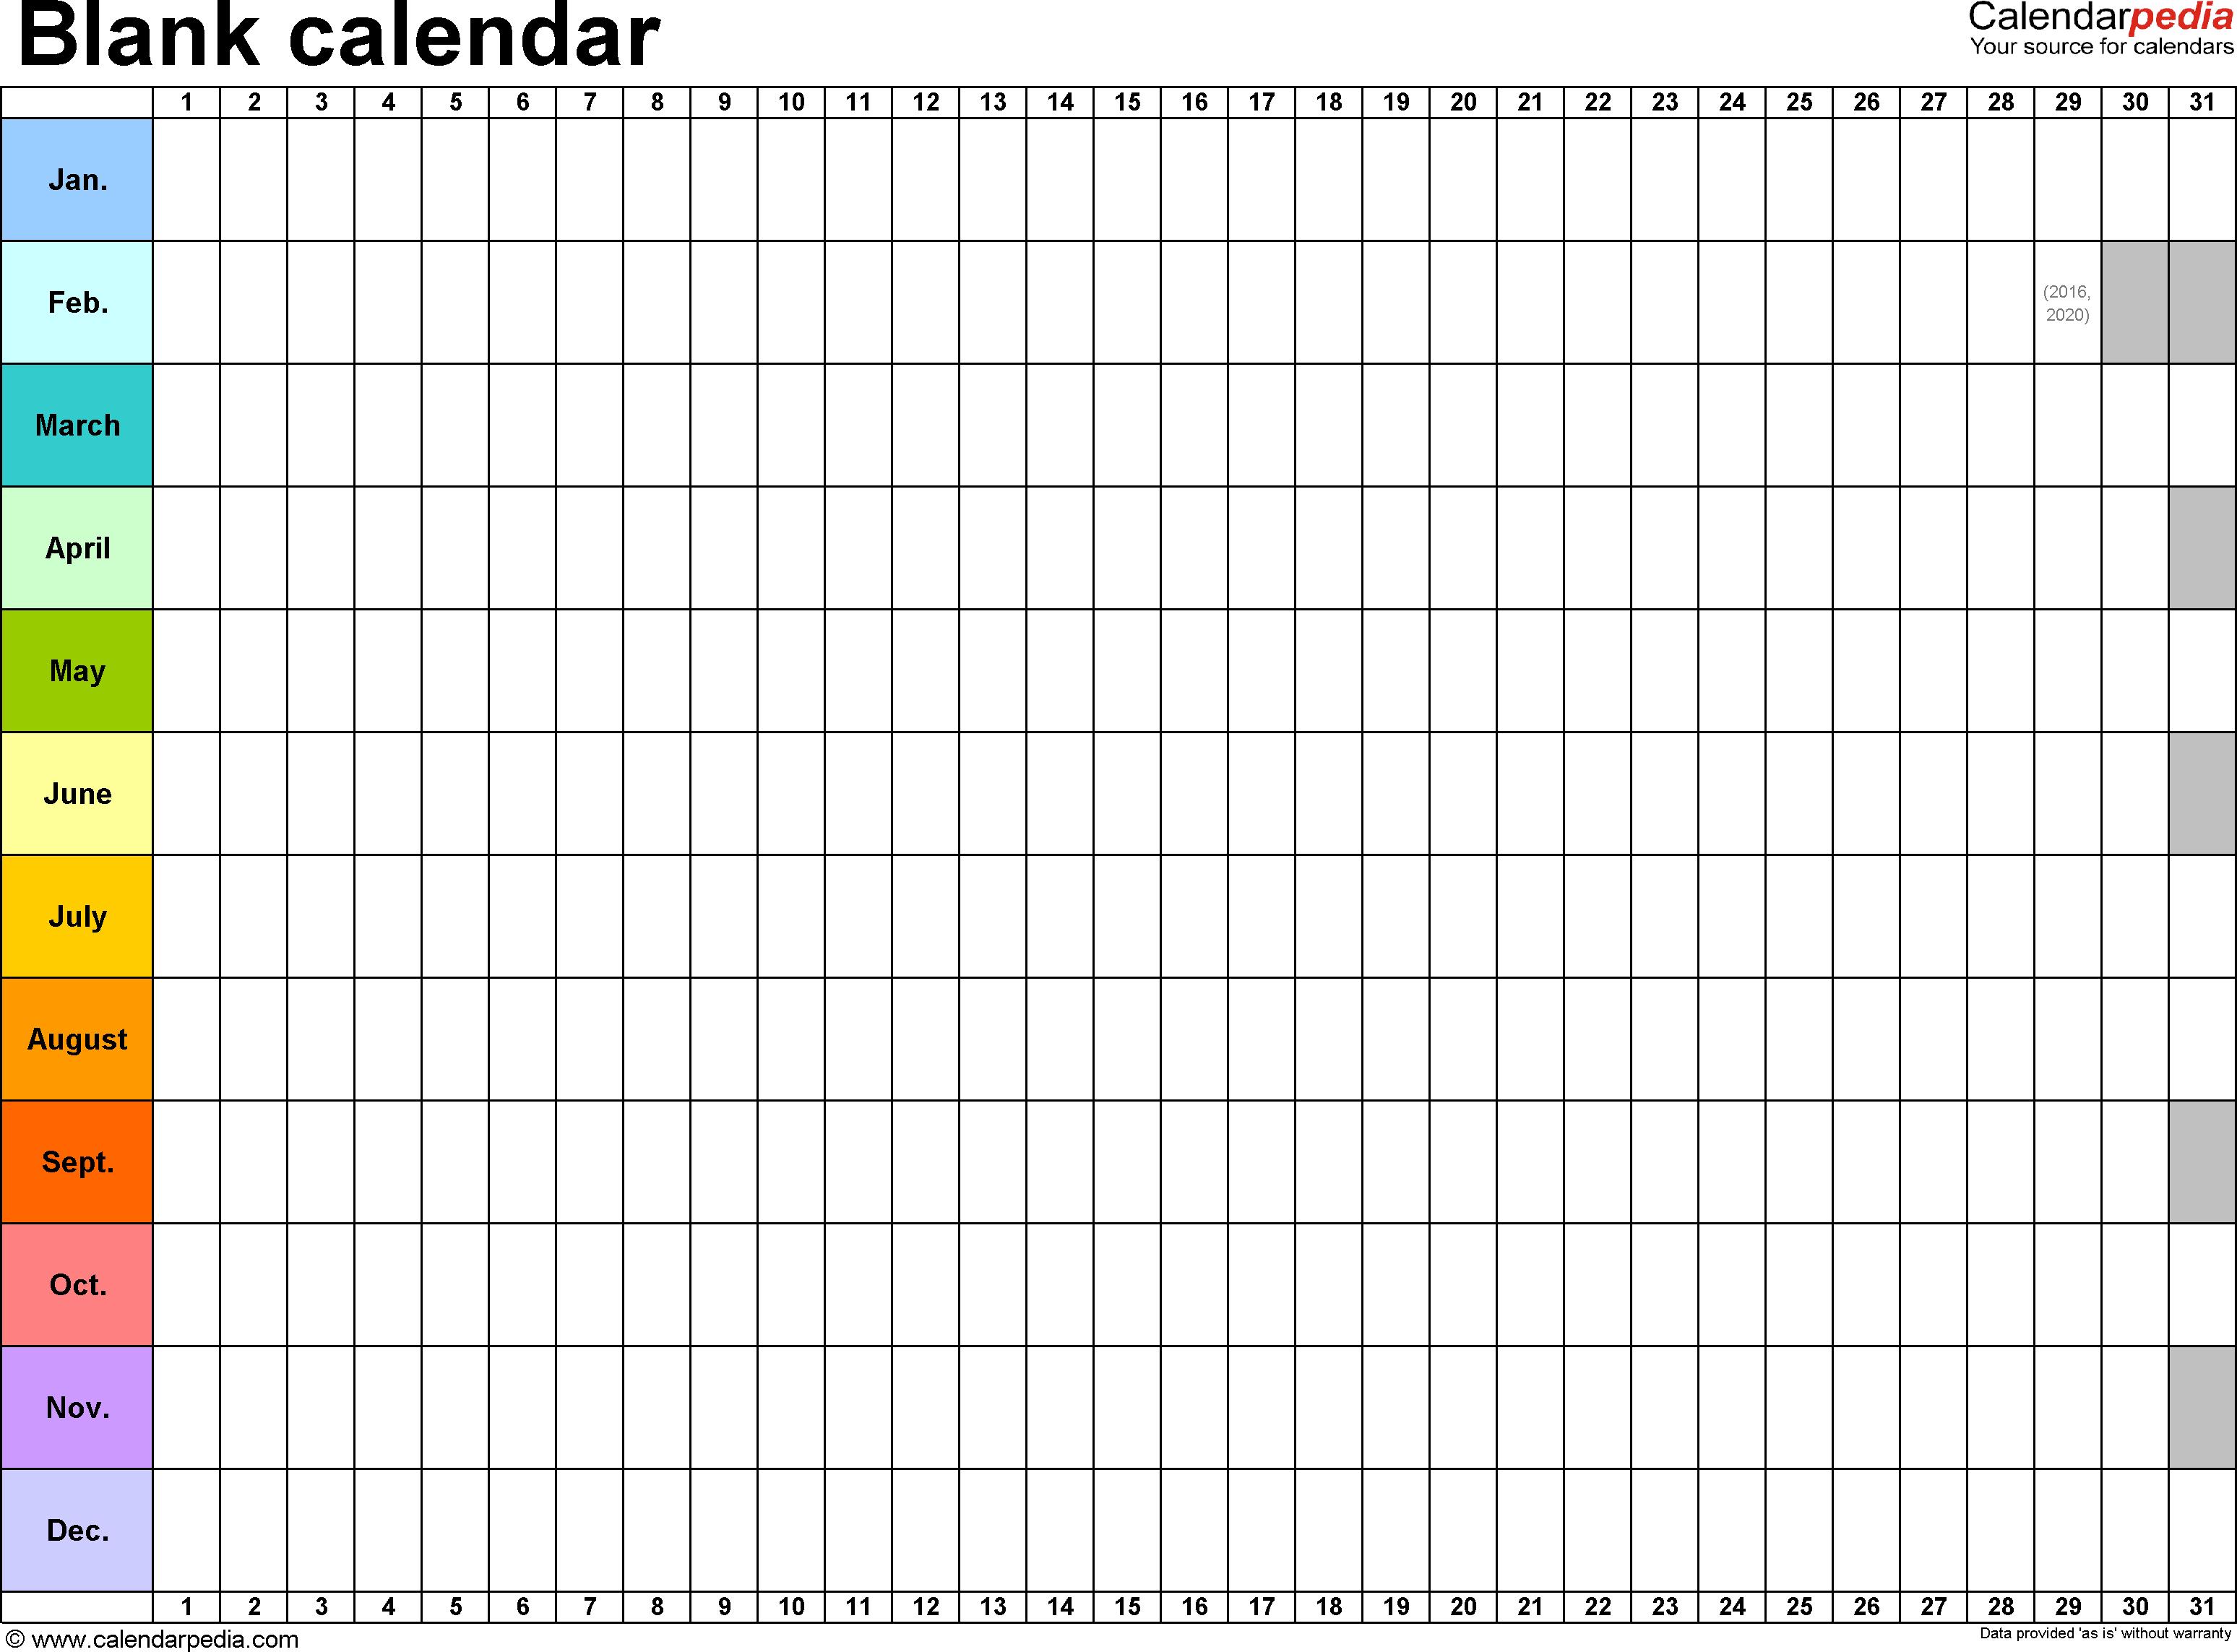 Blank Calendar - 9 Free Printable Microsoft Word Templates within Printable Blank Calendar Template